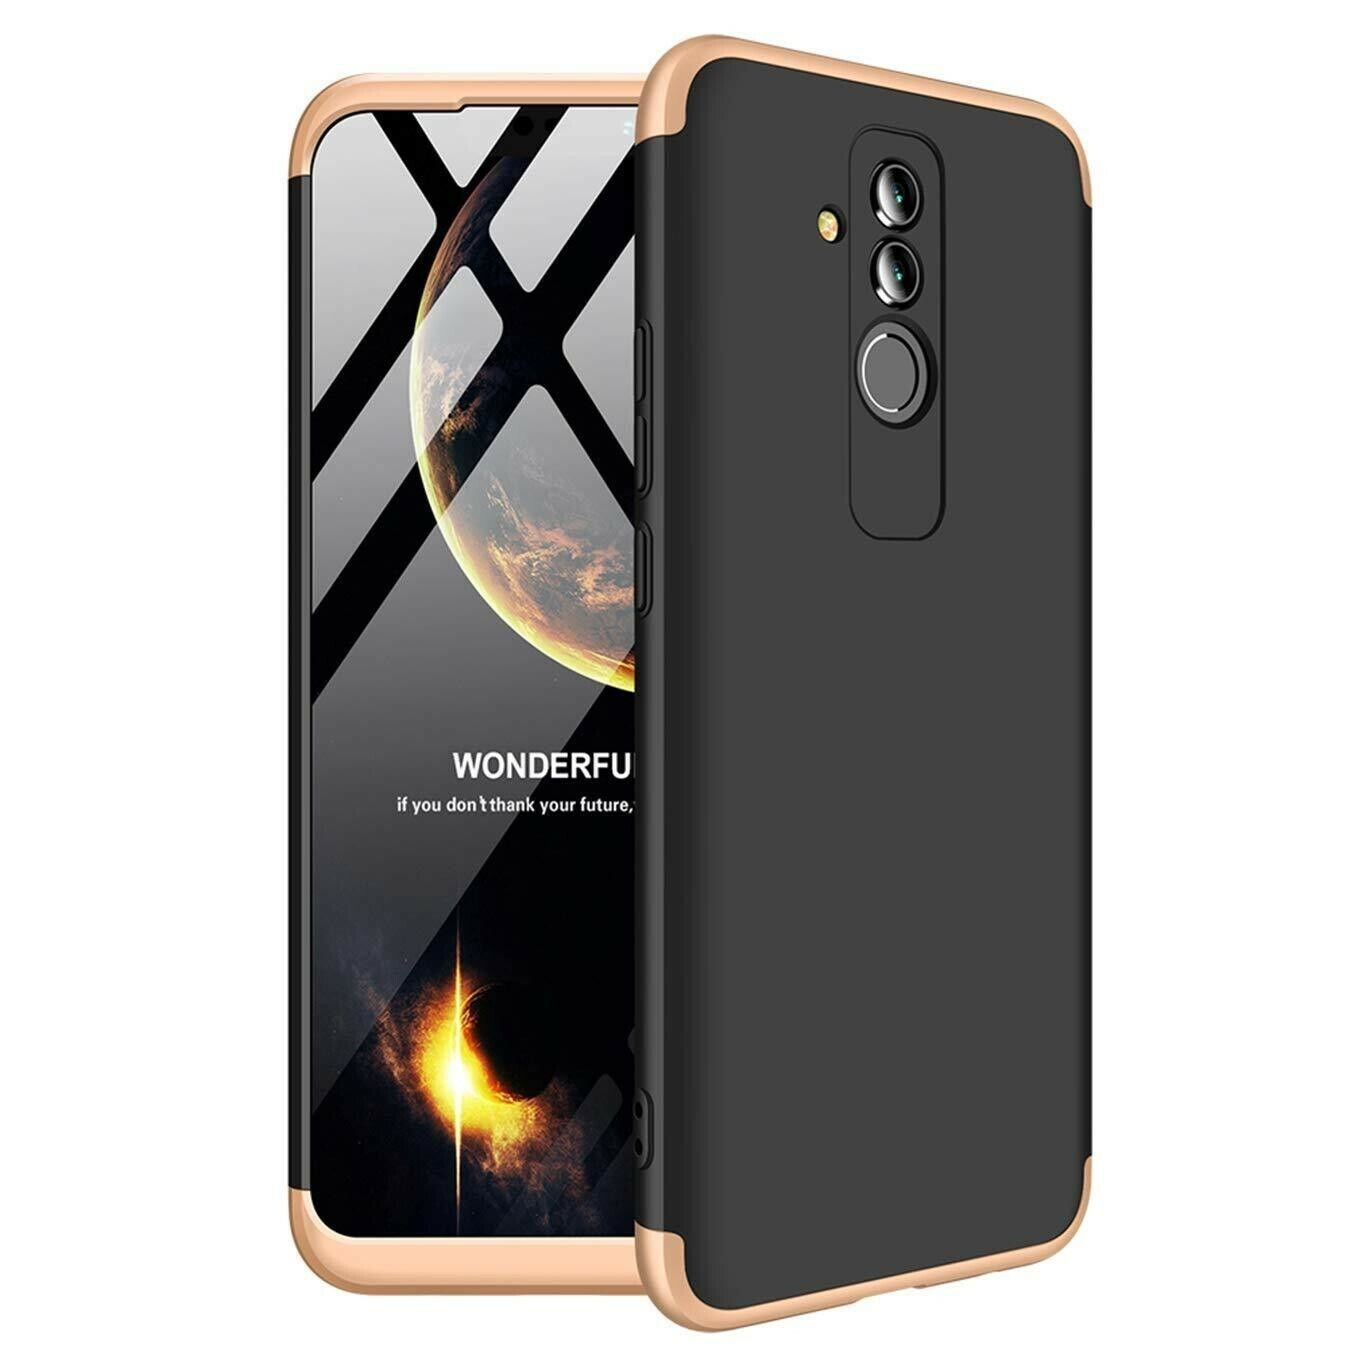 Coque - case cover Huawei Mate 20 Lite Noire - Or (beige) Black -Gold (beige)